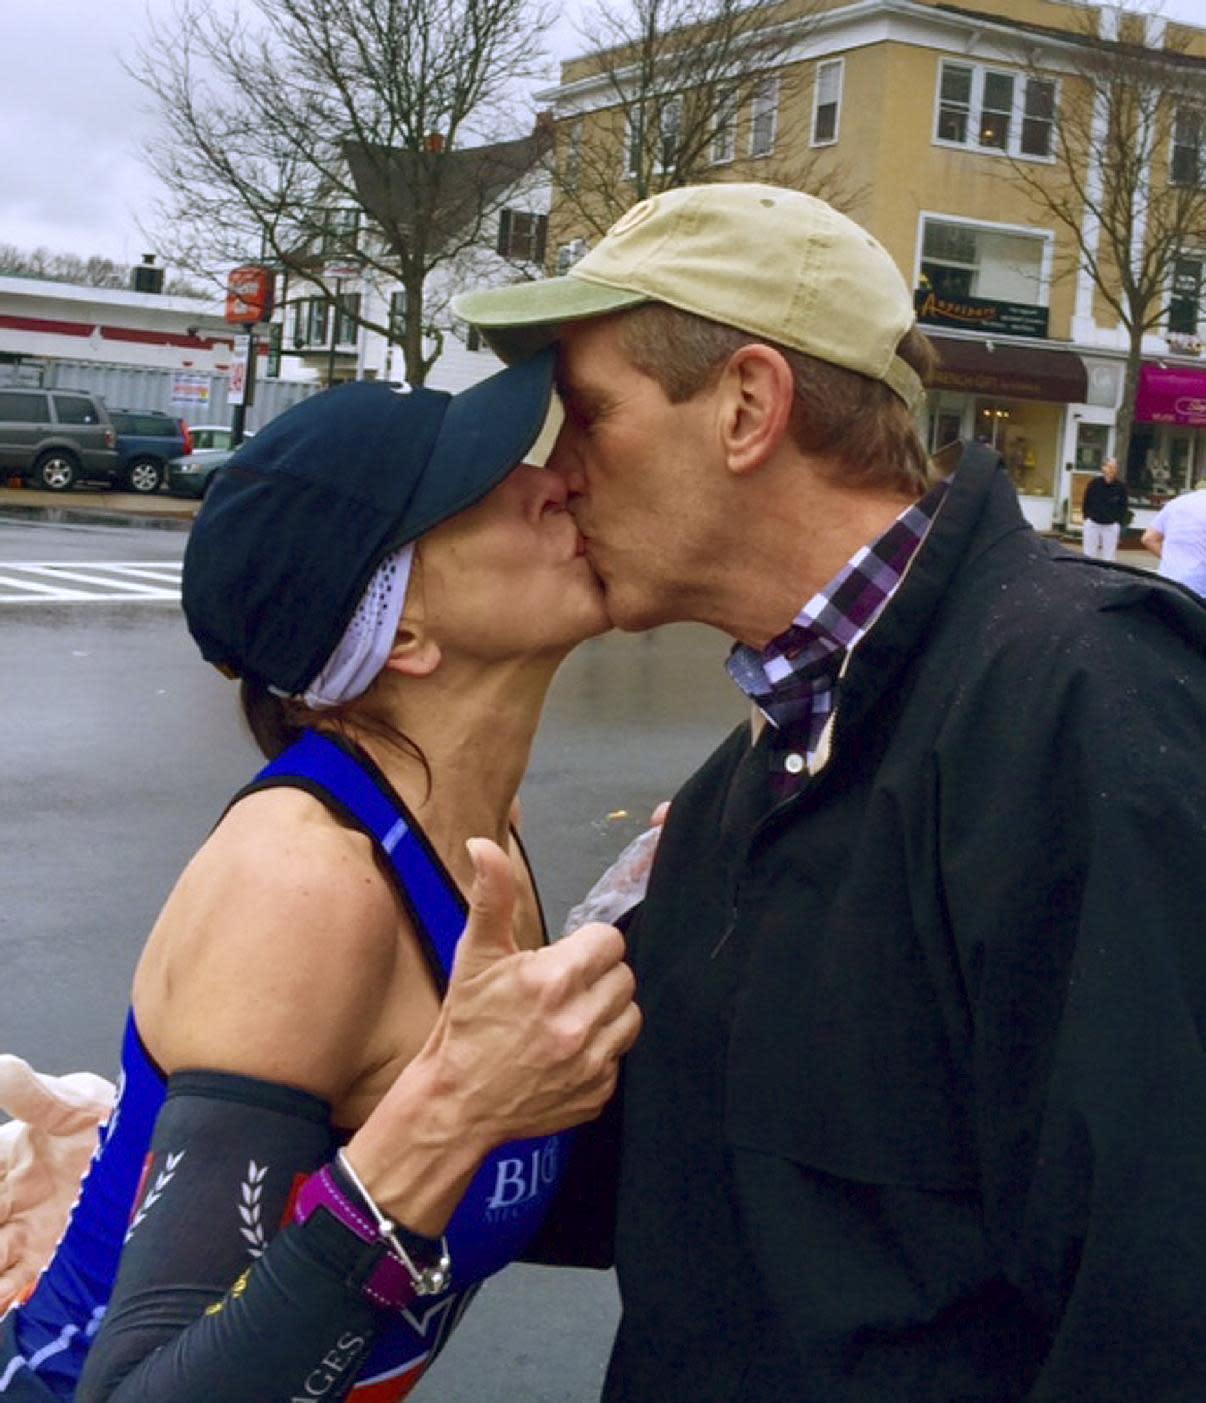 Woman seeking man she kissed at marathon hears from his wife